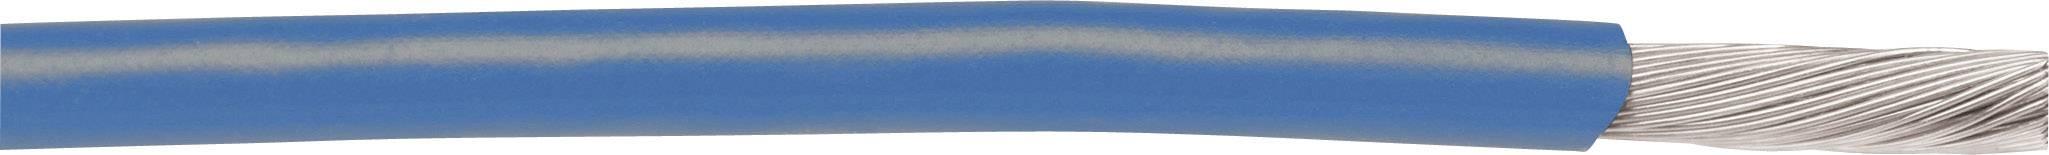 Pletenica EcoWire 1 x 2.08 mm, modra AlphaWire 6717 30.5 m